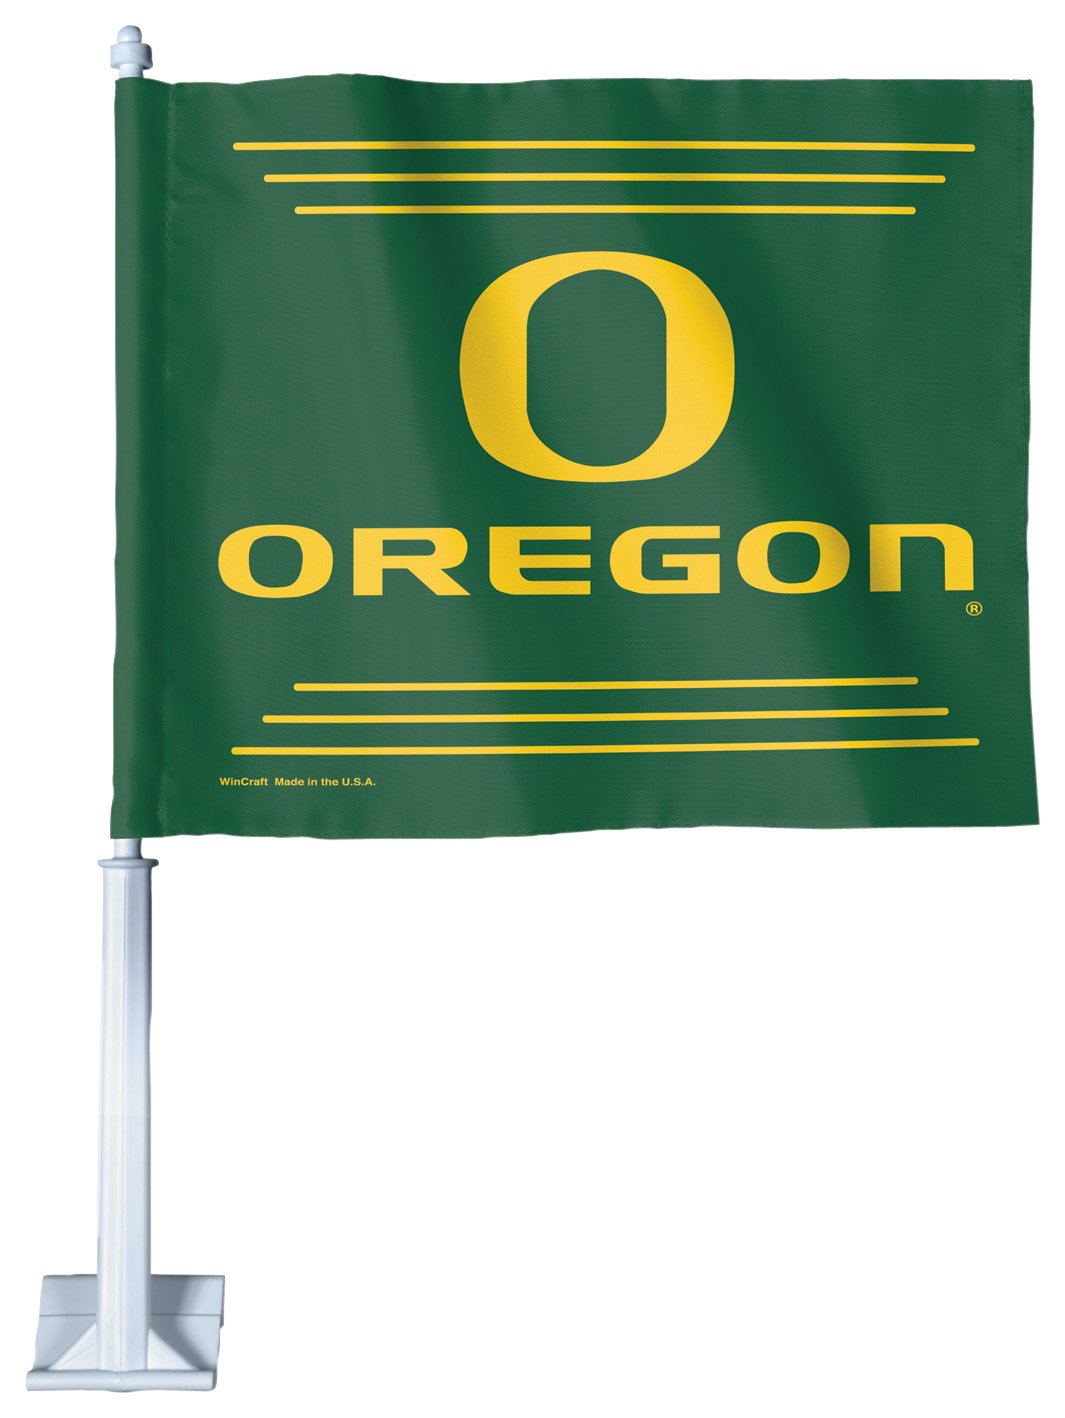 NCAA Oregon Ducks車フラグ   B003MA0J88